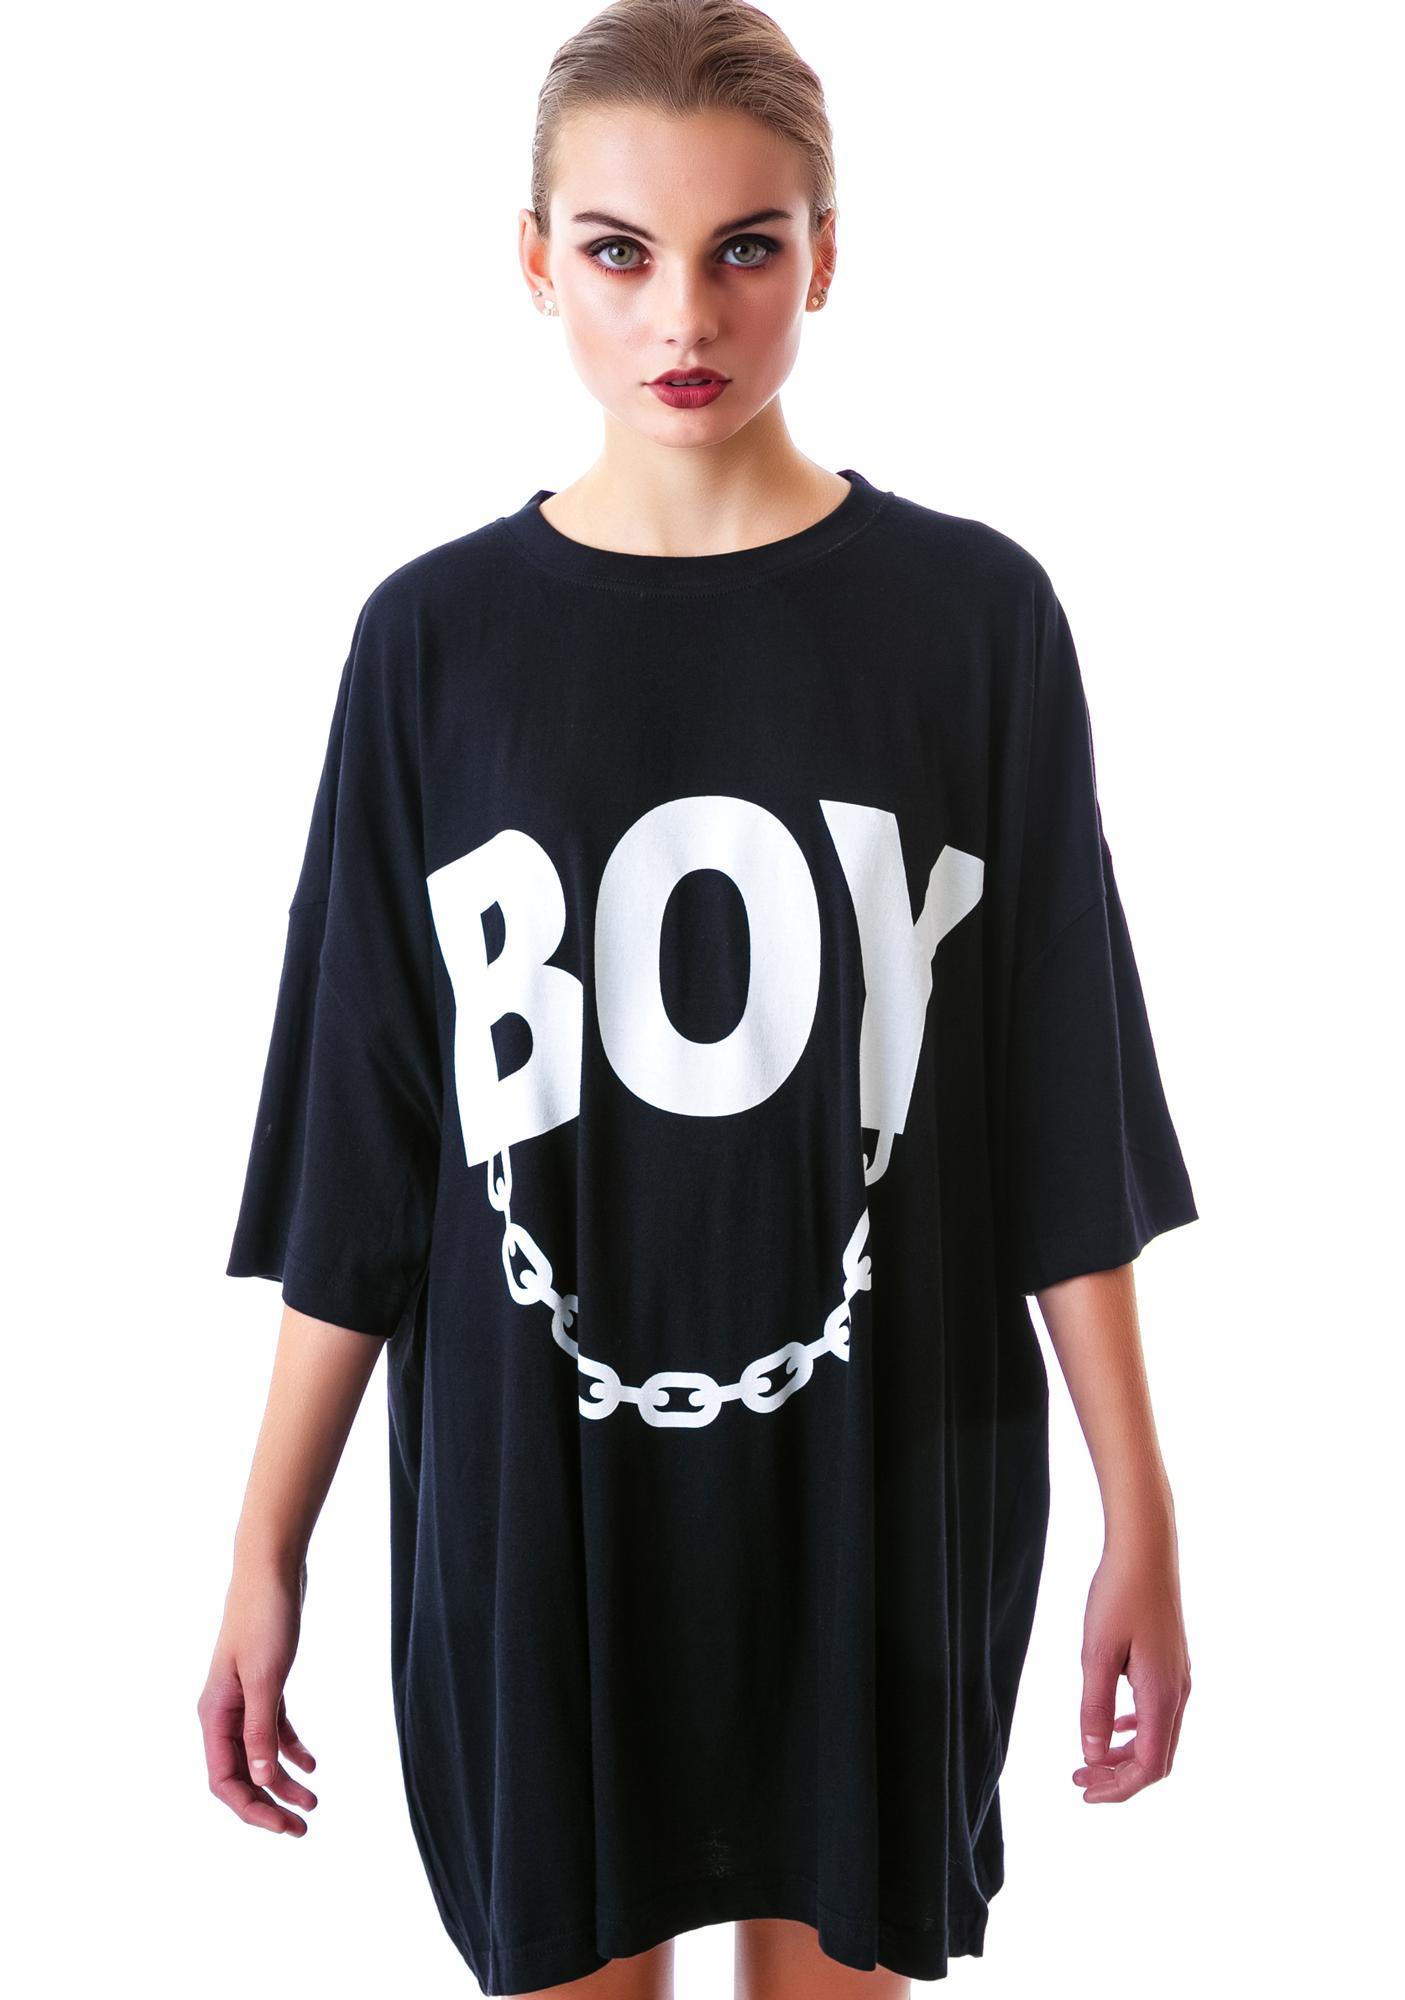 Long Clothing x BOY London Boy Chain Oversized Tee